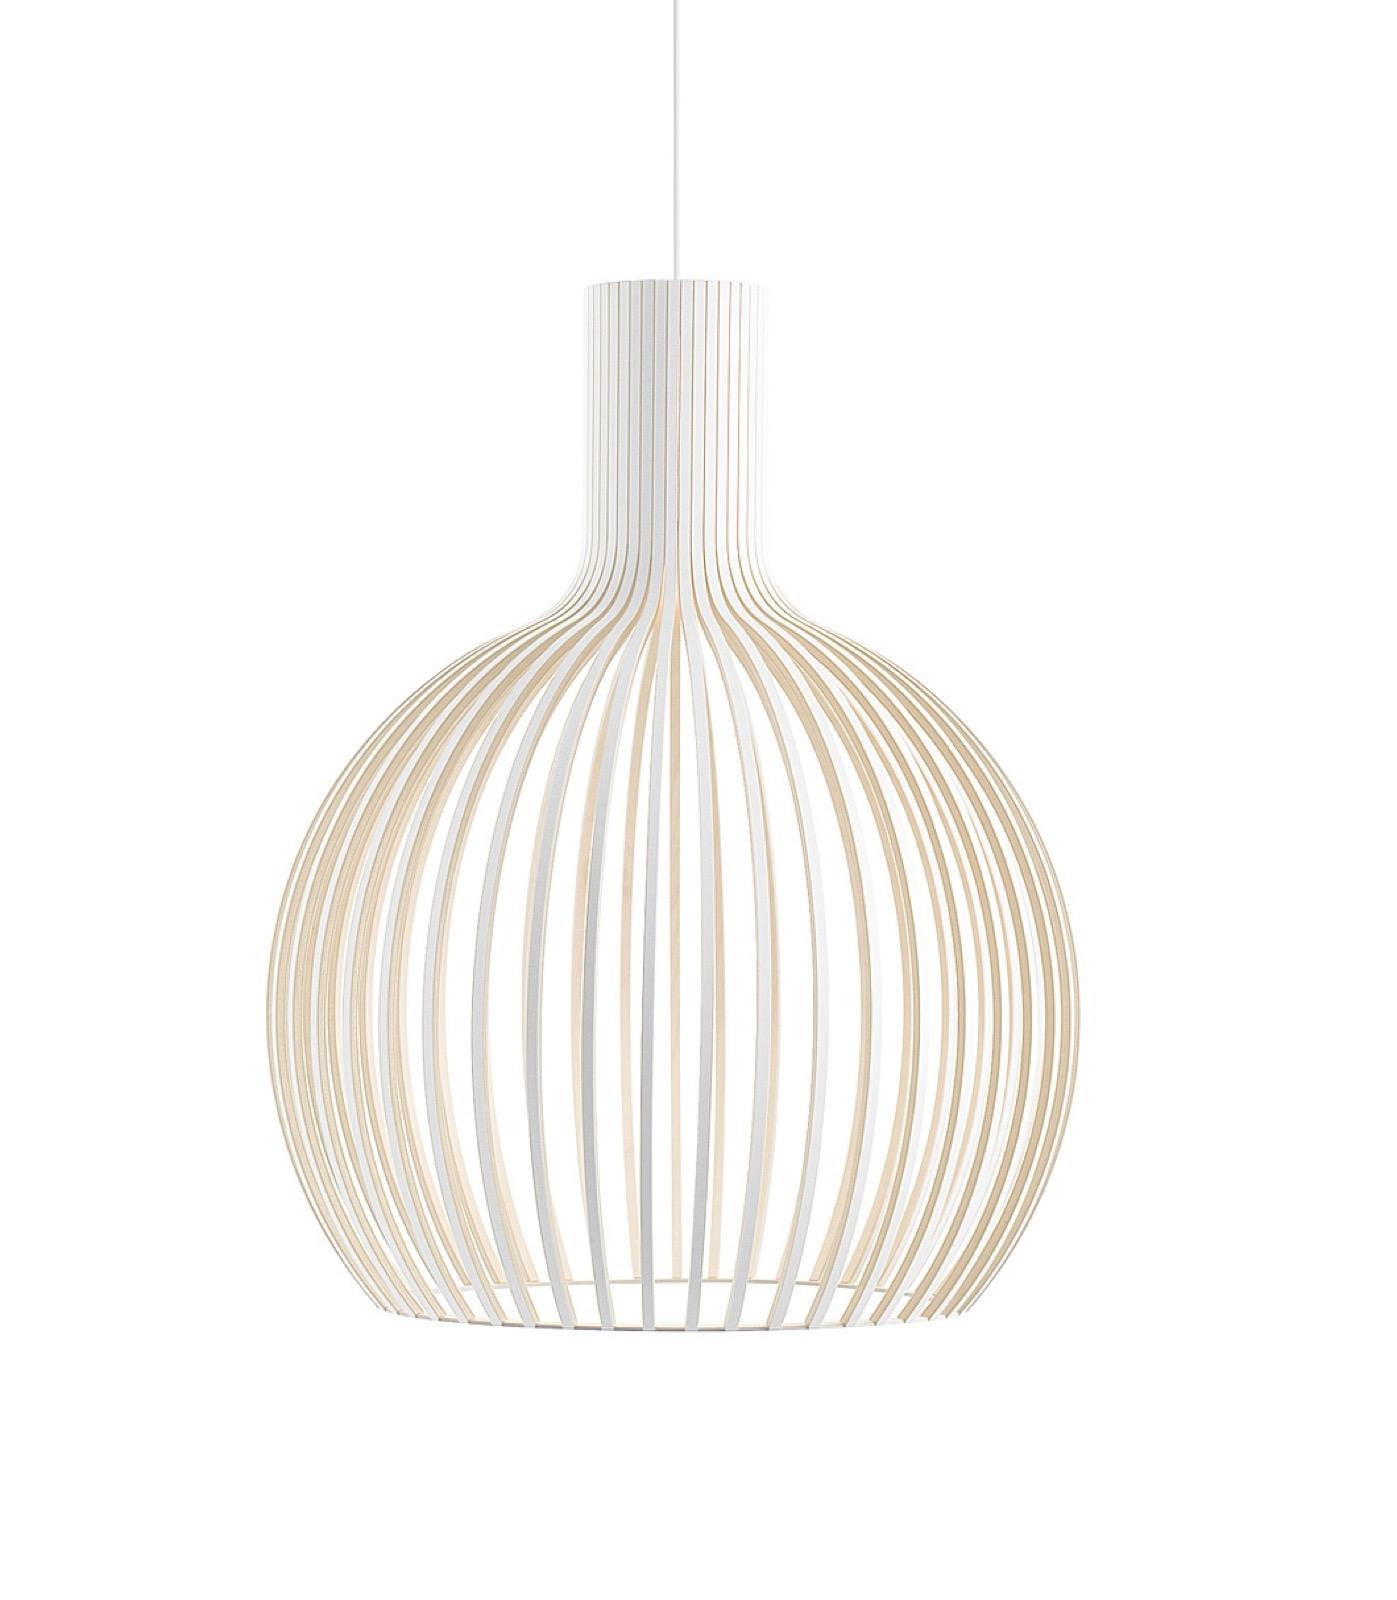 Secto Design Octo 4240 hanglamp   Matser Wageningen